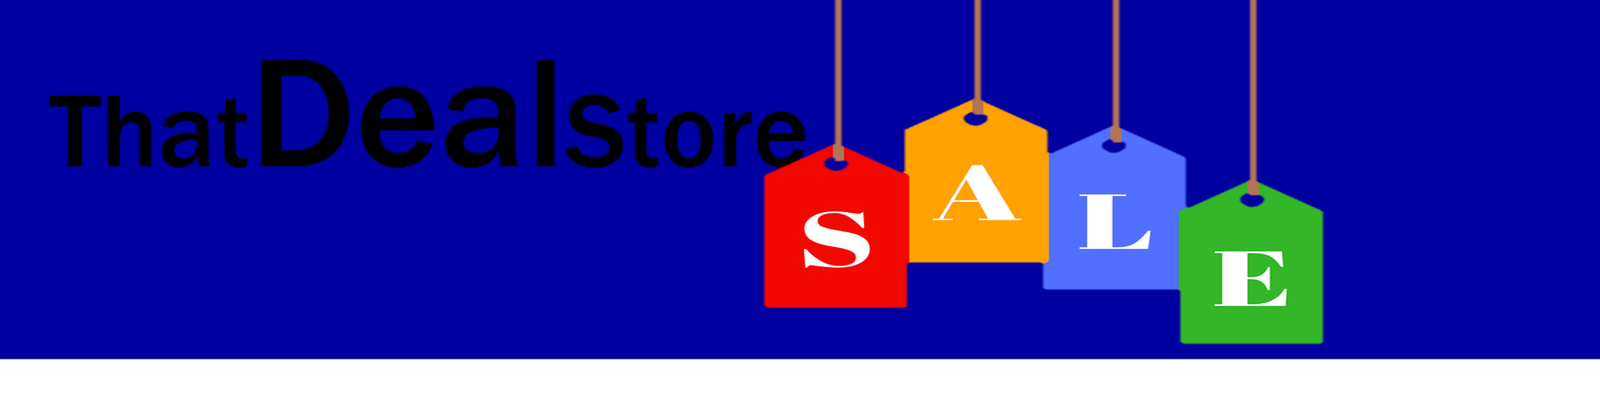 ThatDealStore